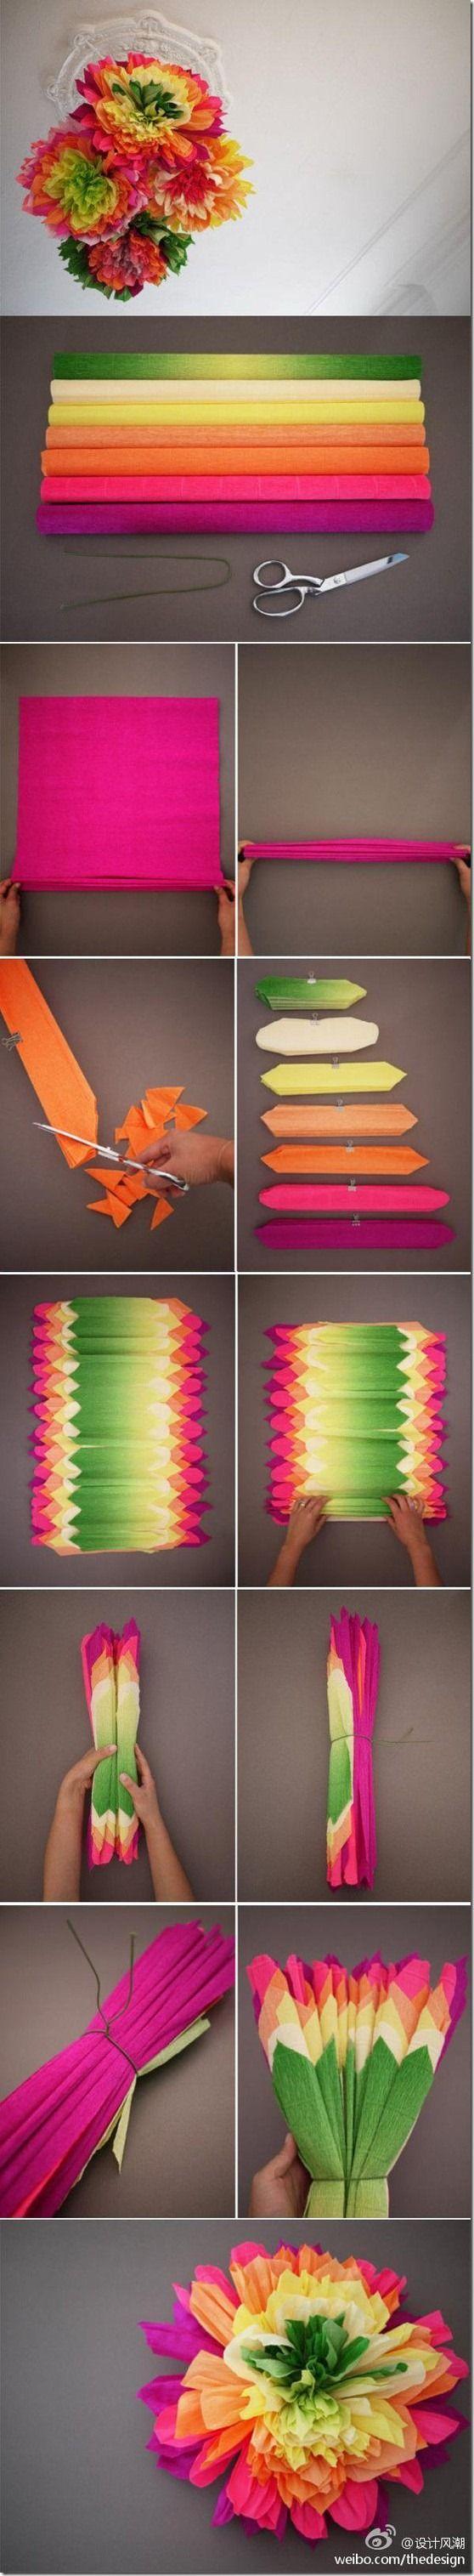 Multi-colored tissue paper pom pom flowers